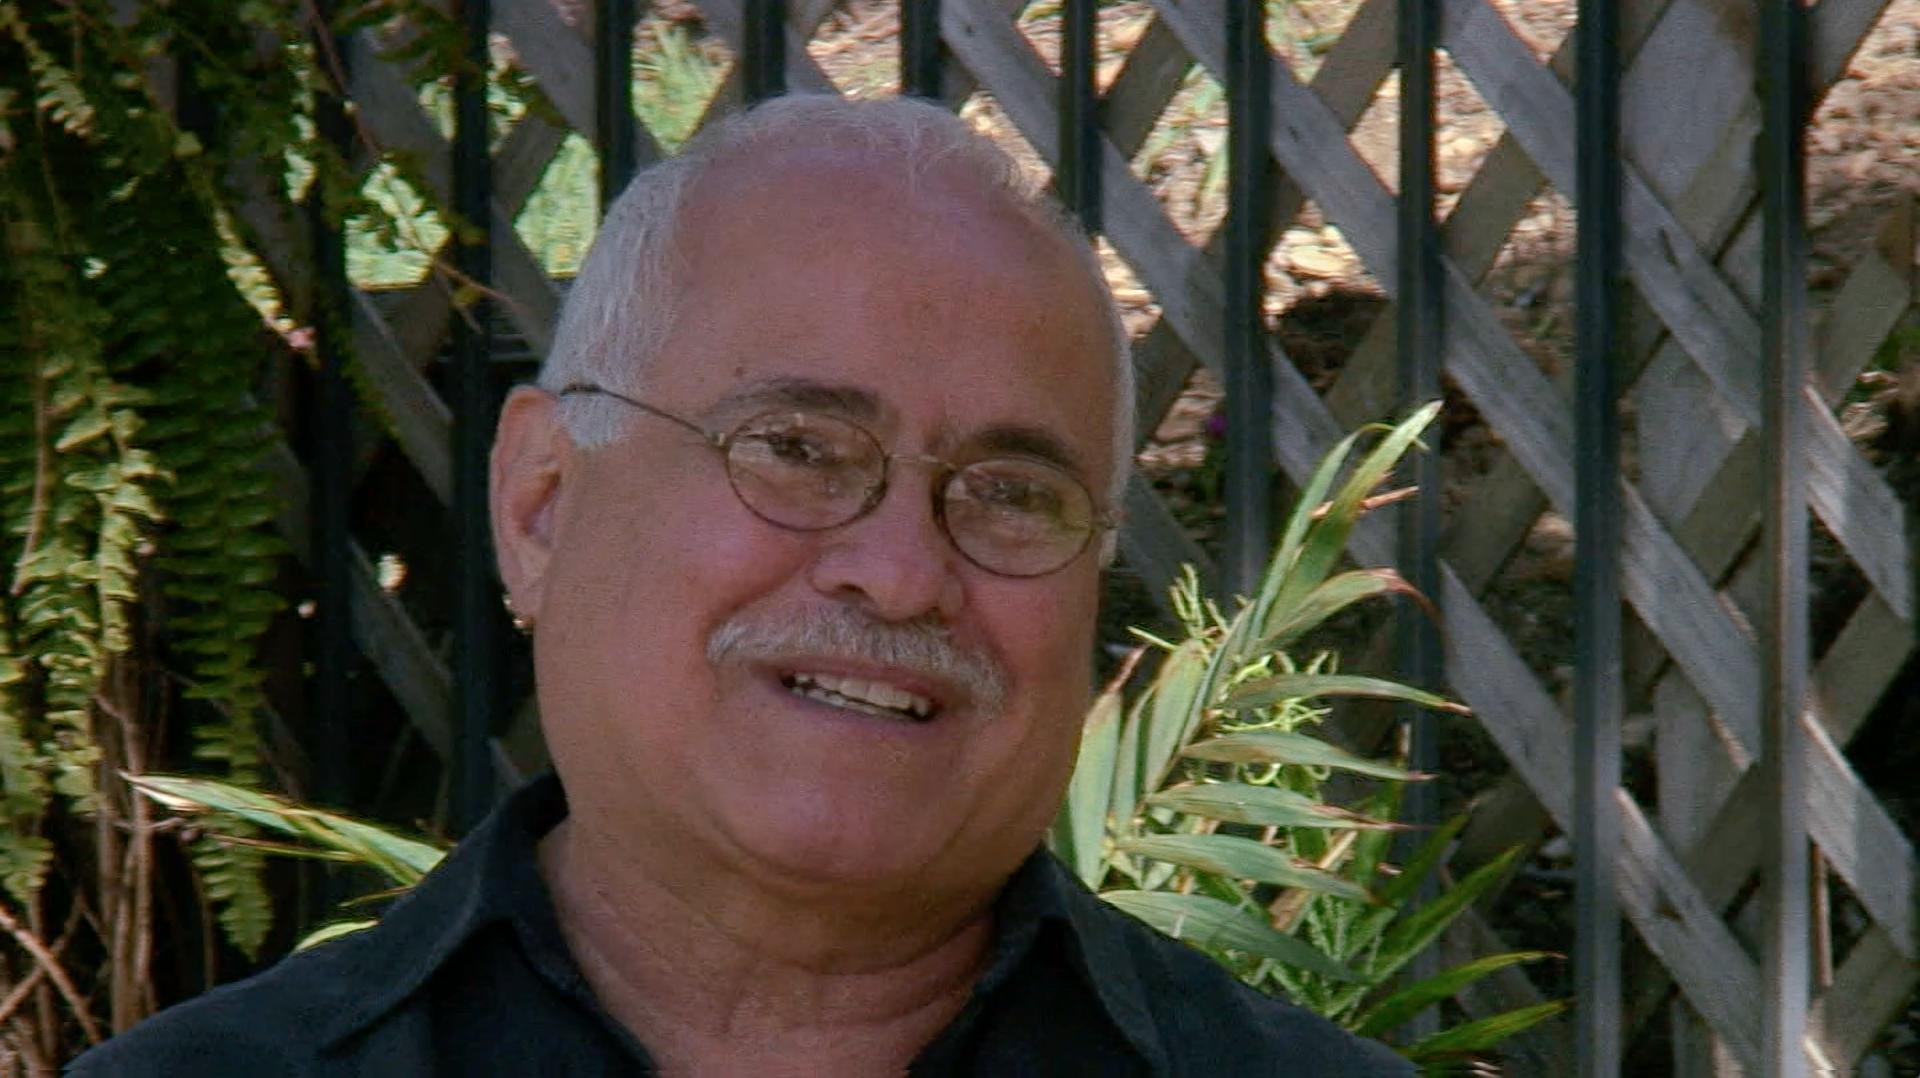 Jorge Huerta